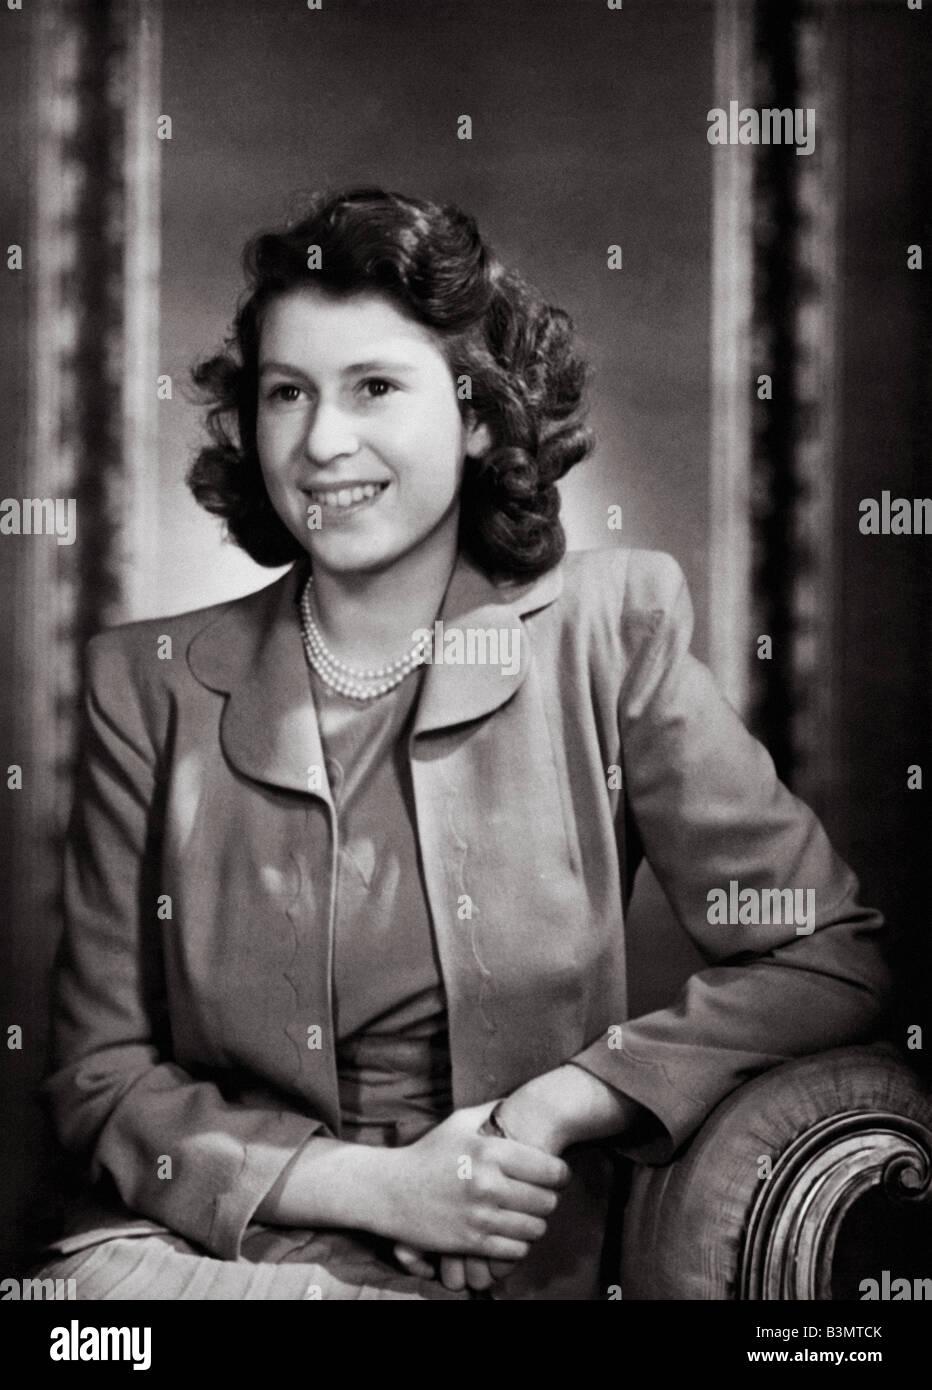 PRINCESS ELIZABETH (later Queen Elizabeth II) about 1945 - Stock Image